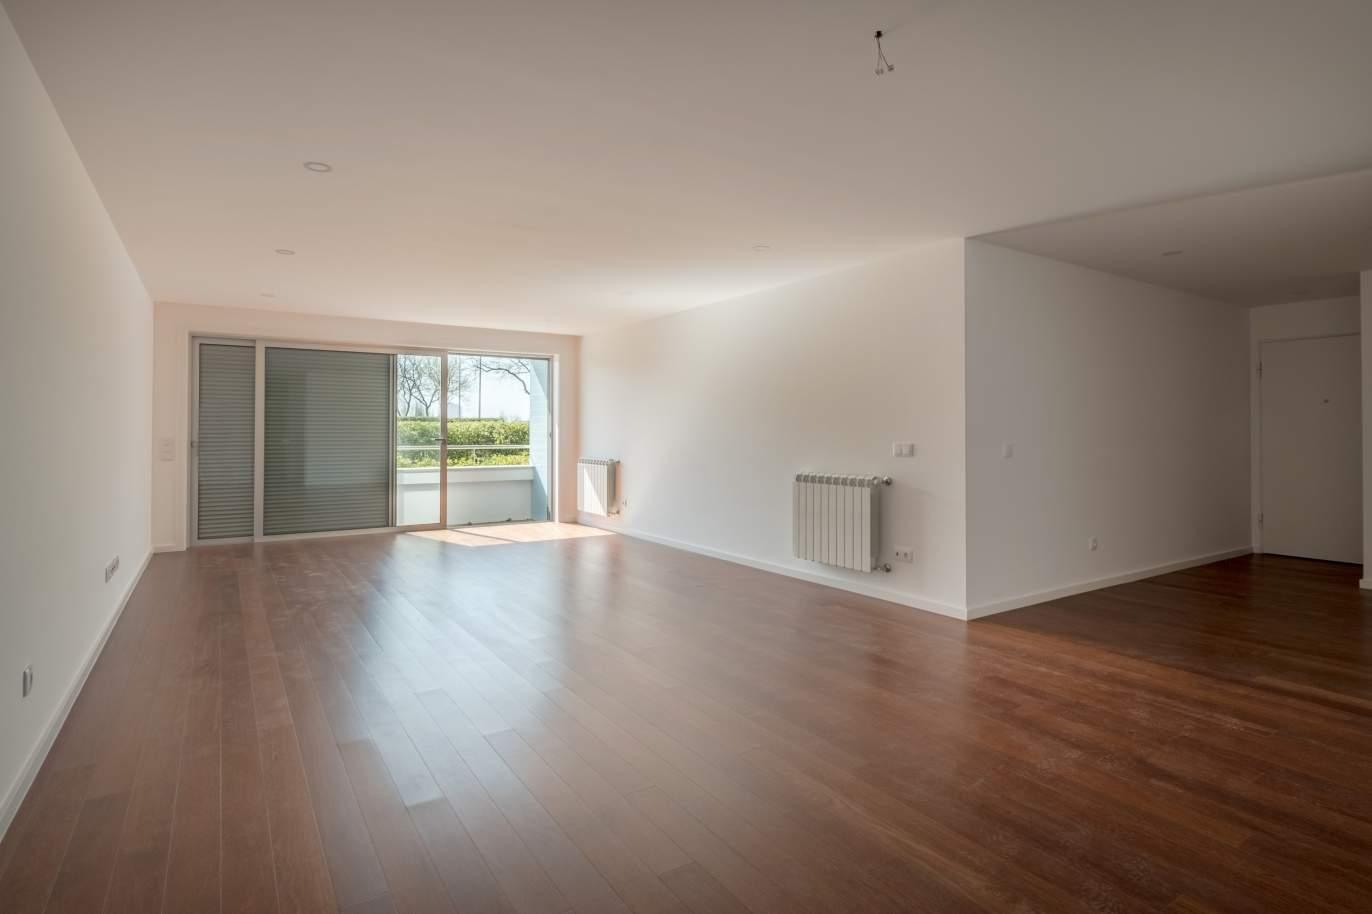 apartment-for-sale-near-the-city-park-and-the-beach-matosinhos-portugal